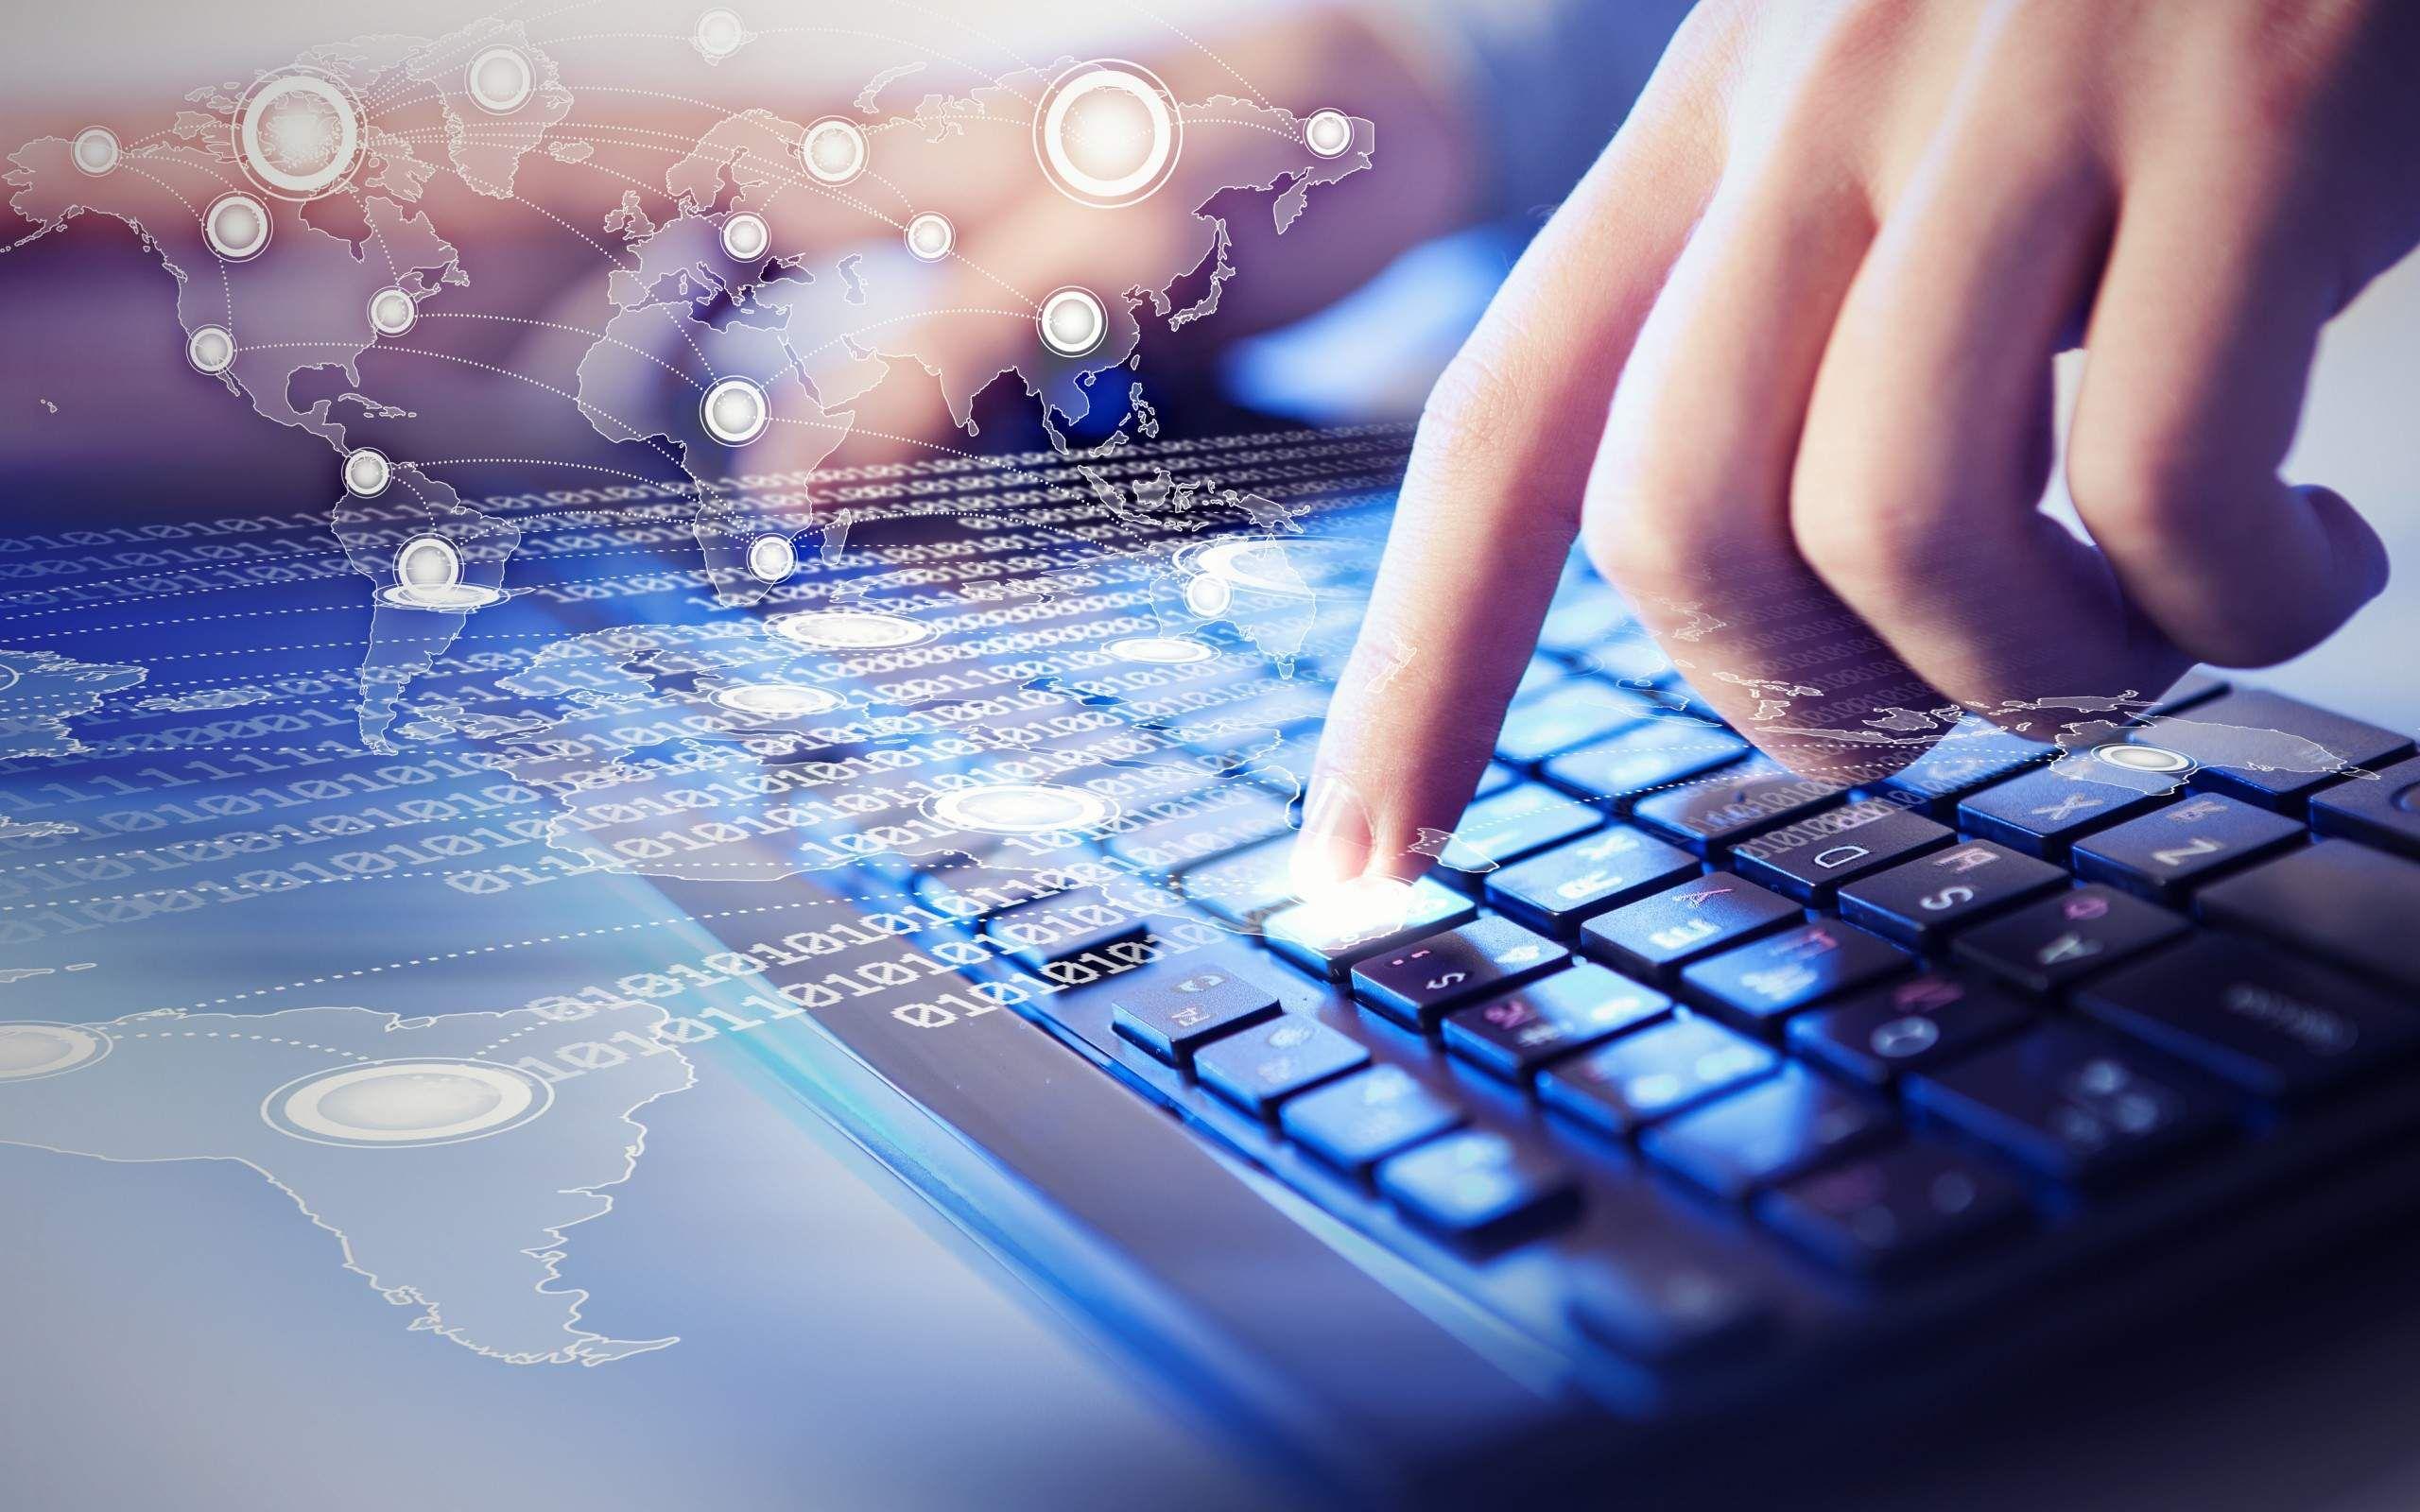 Innovation Technology Wallpaper Hd Technology Wallpaper Innovation Technology Software Bug